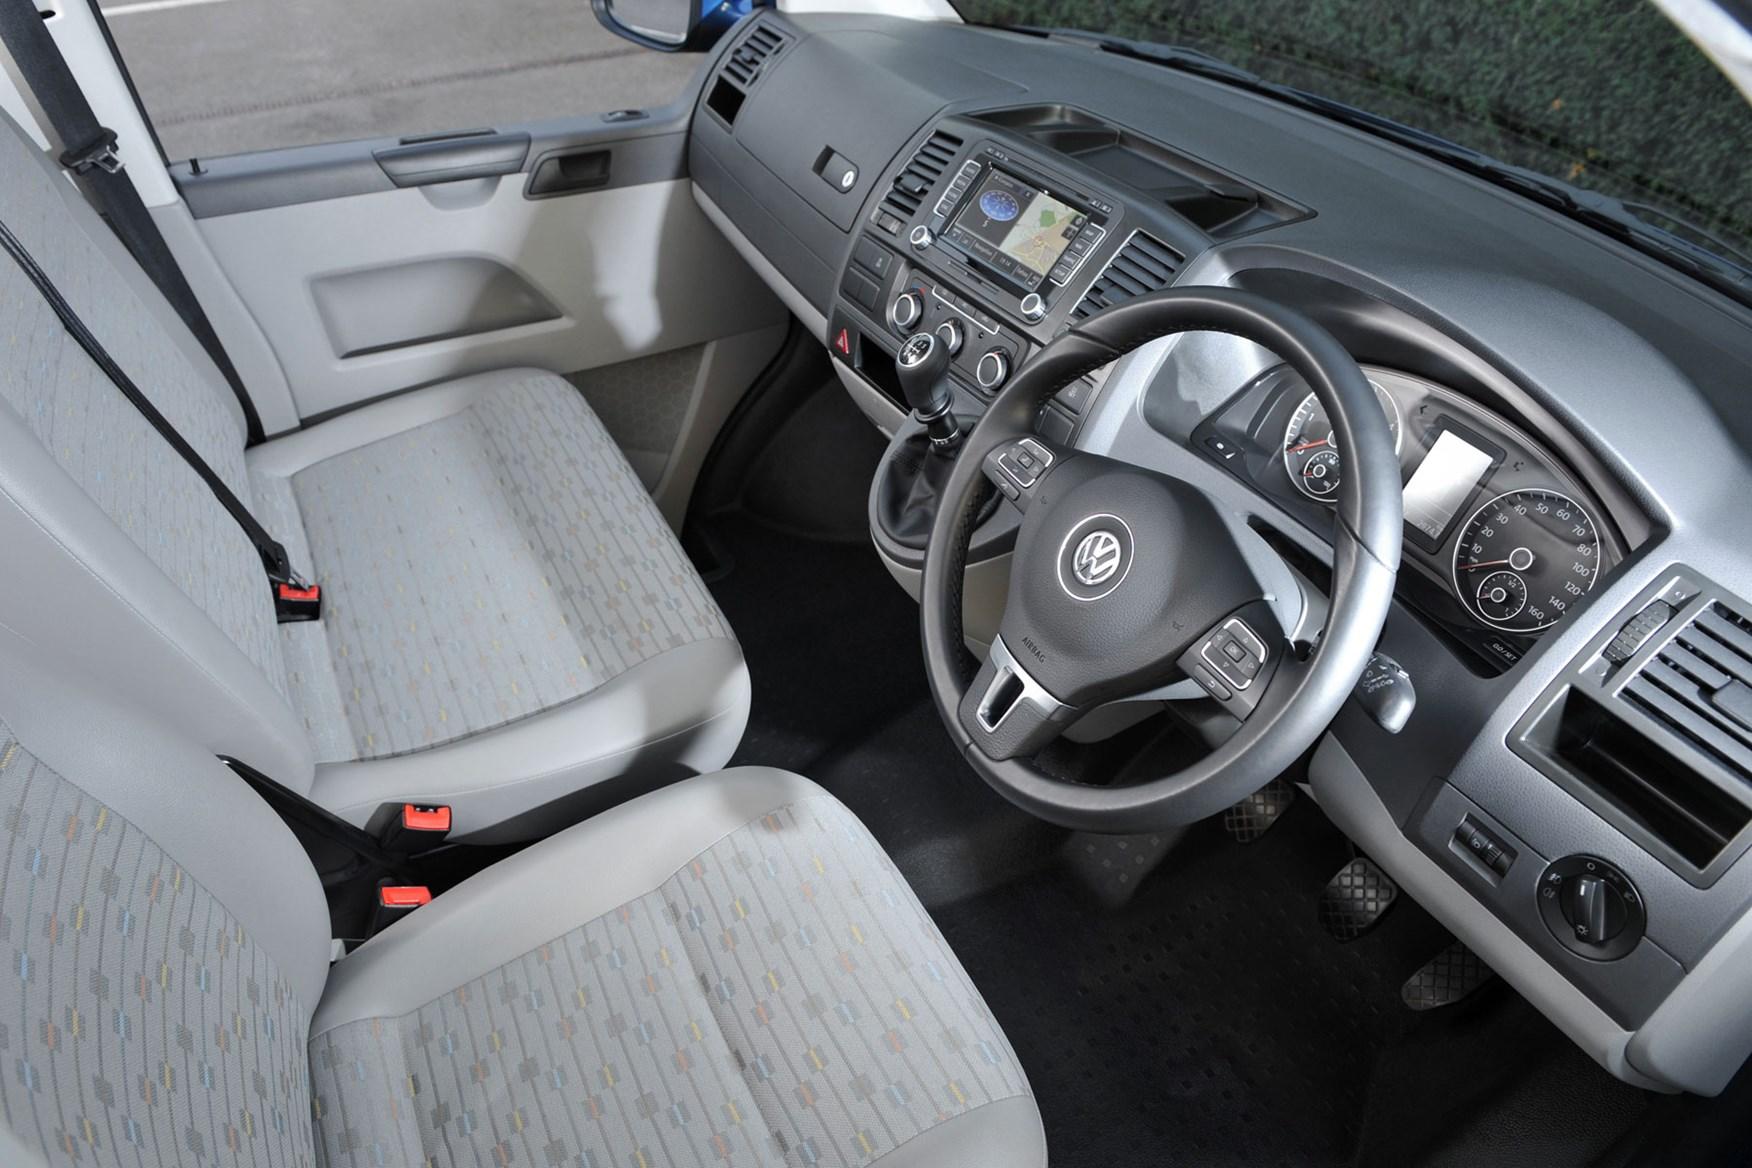 VW Transporter T5 (2010-2015) cab interior